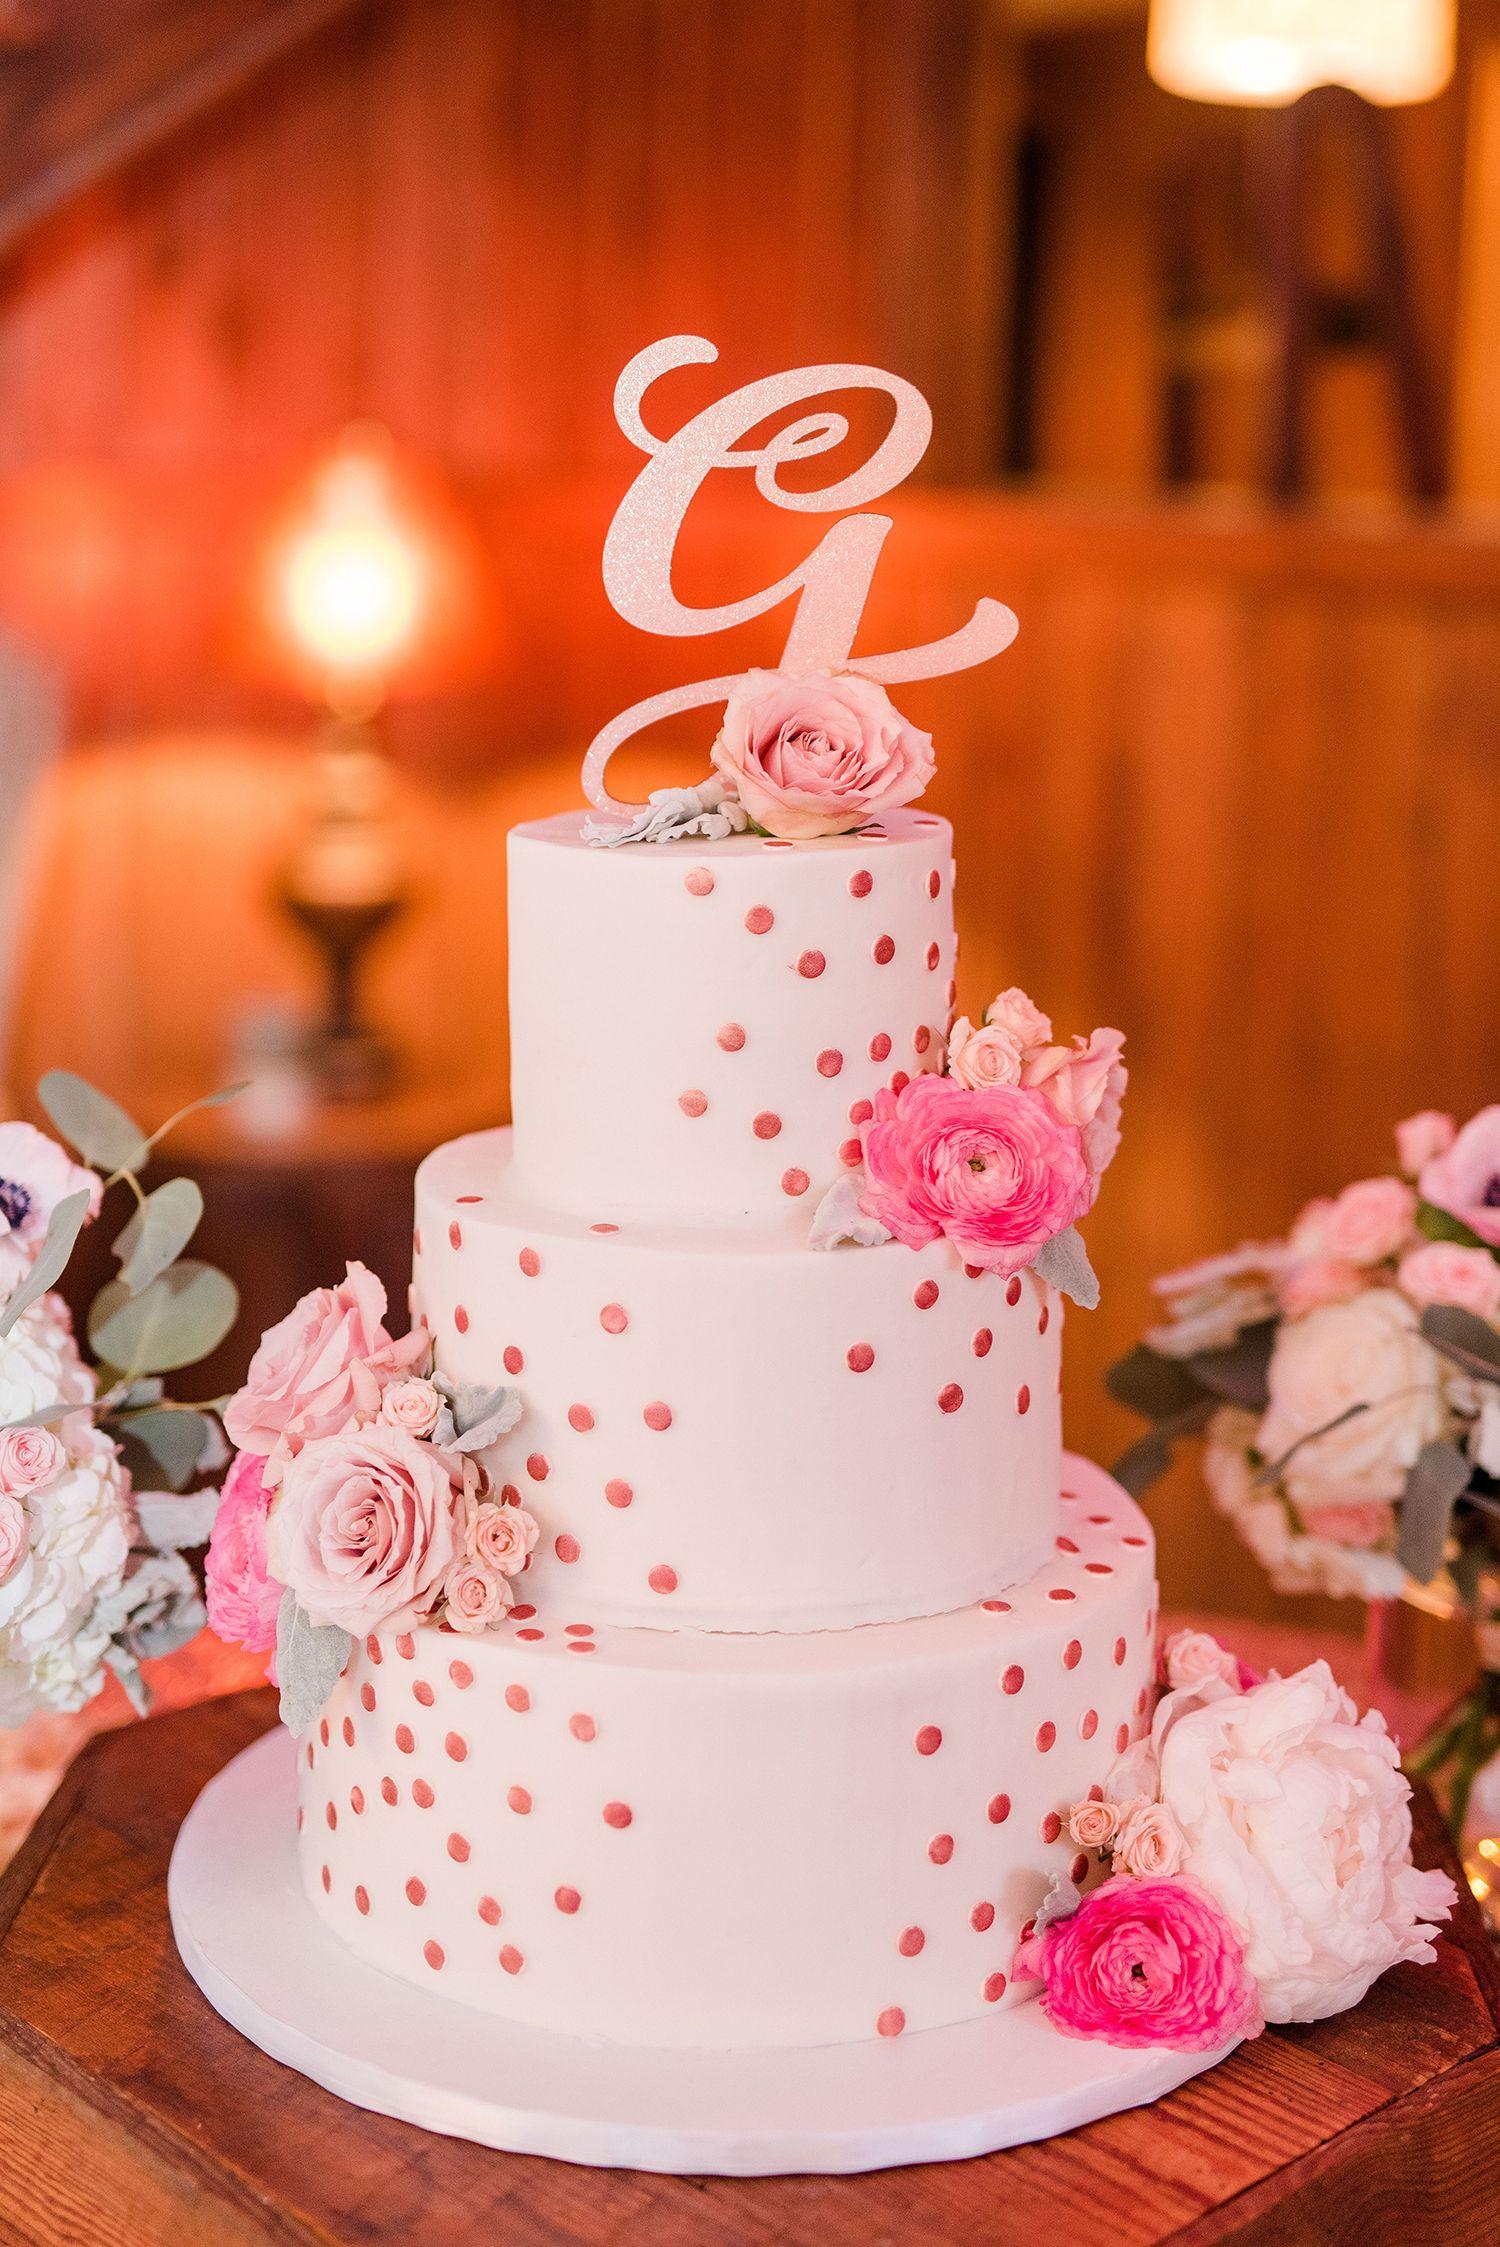 Casablanca Bridal Wedding Cake Torta Ekkor 2018 Pinterest